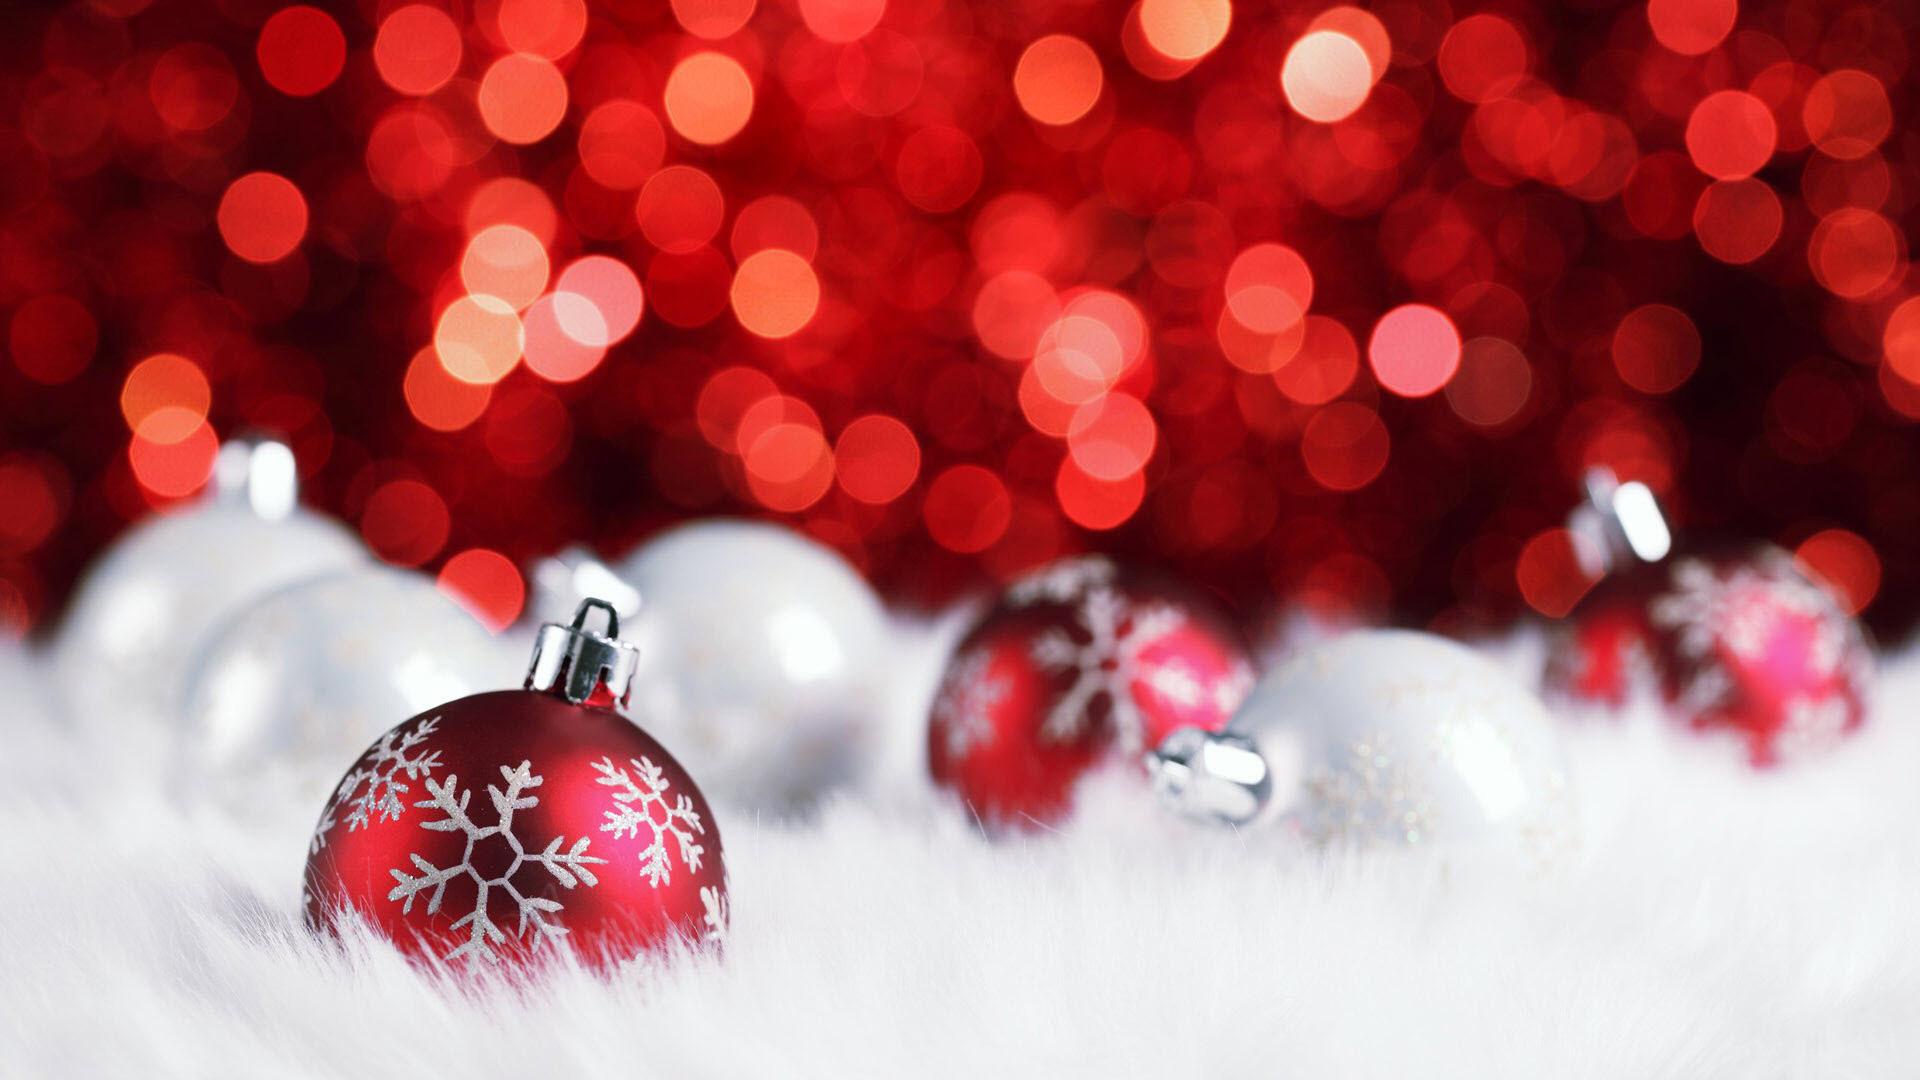 Res: 1920x1080, 2015 Christmas desktop backgrounds 2